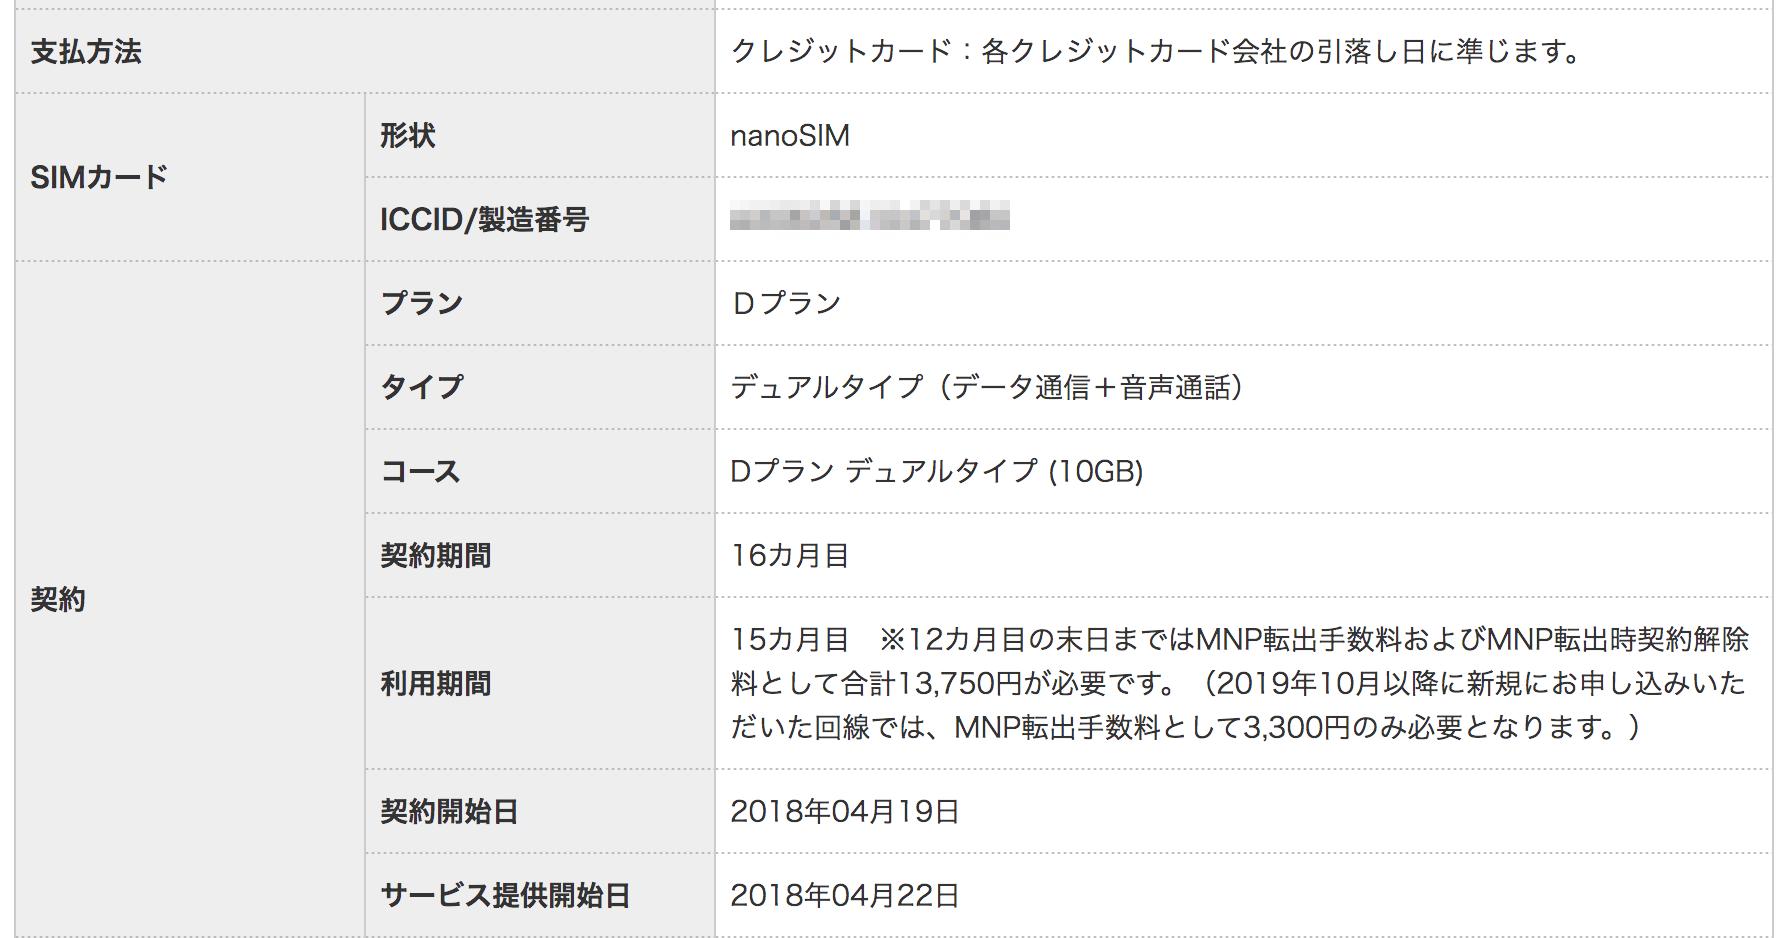 mineoの2019年7月時点の契約情報